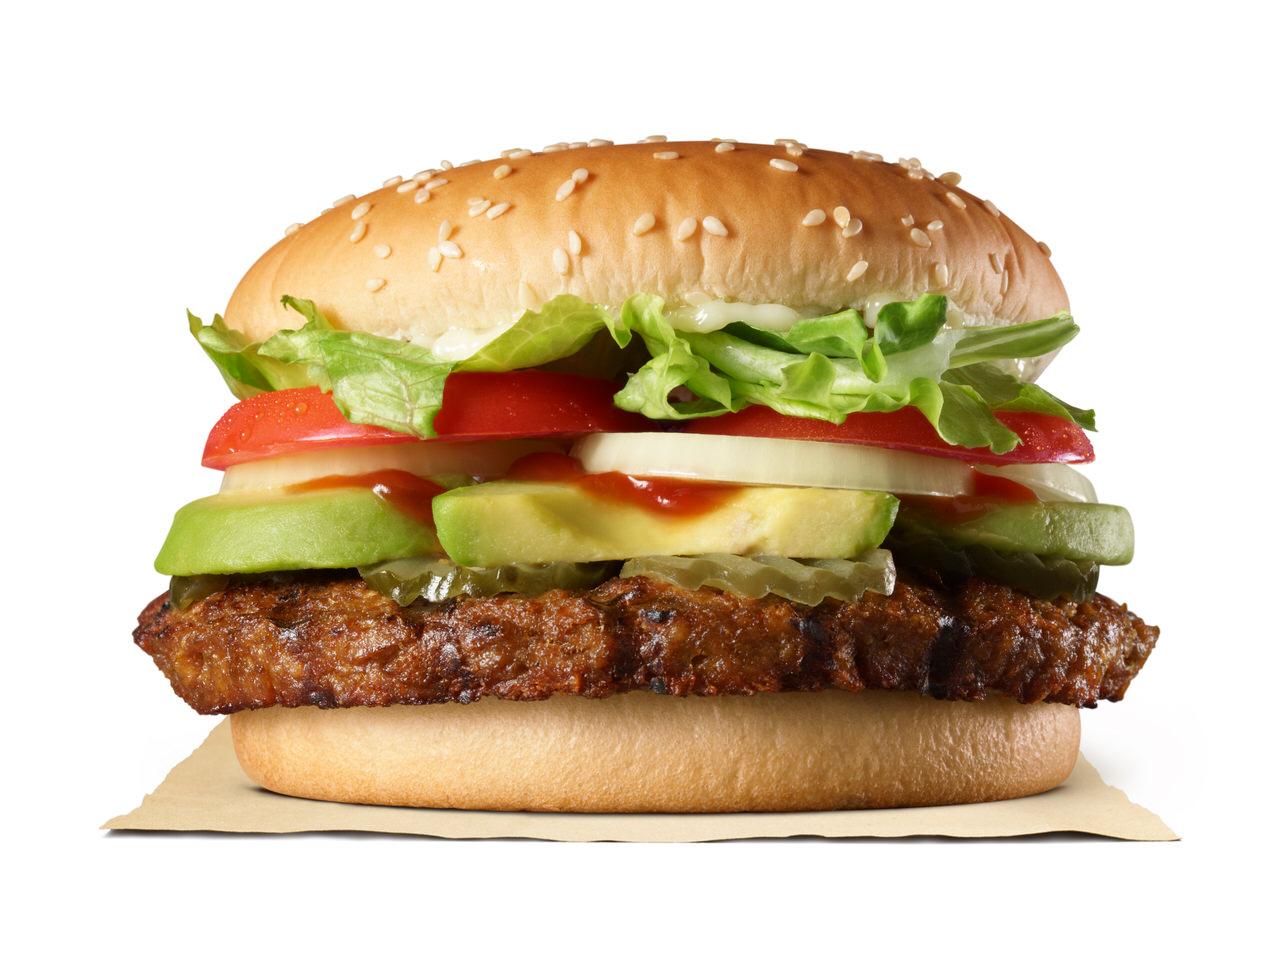 Burgerking avocado 202102 3